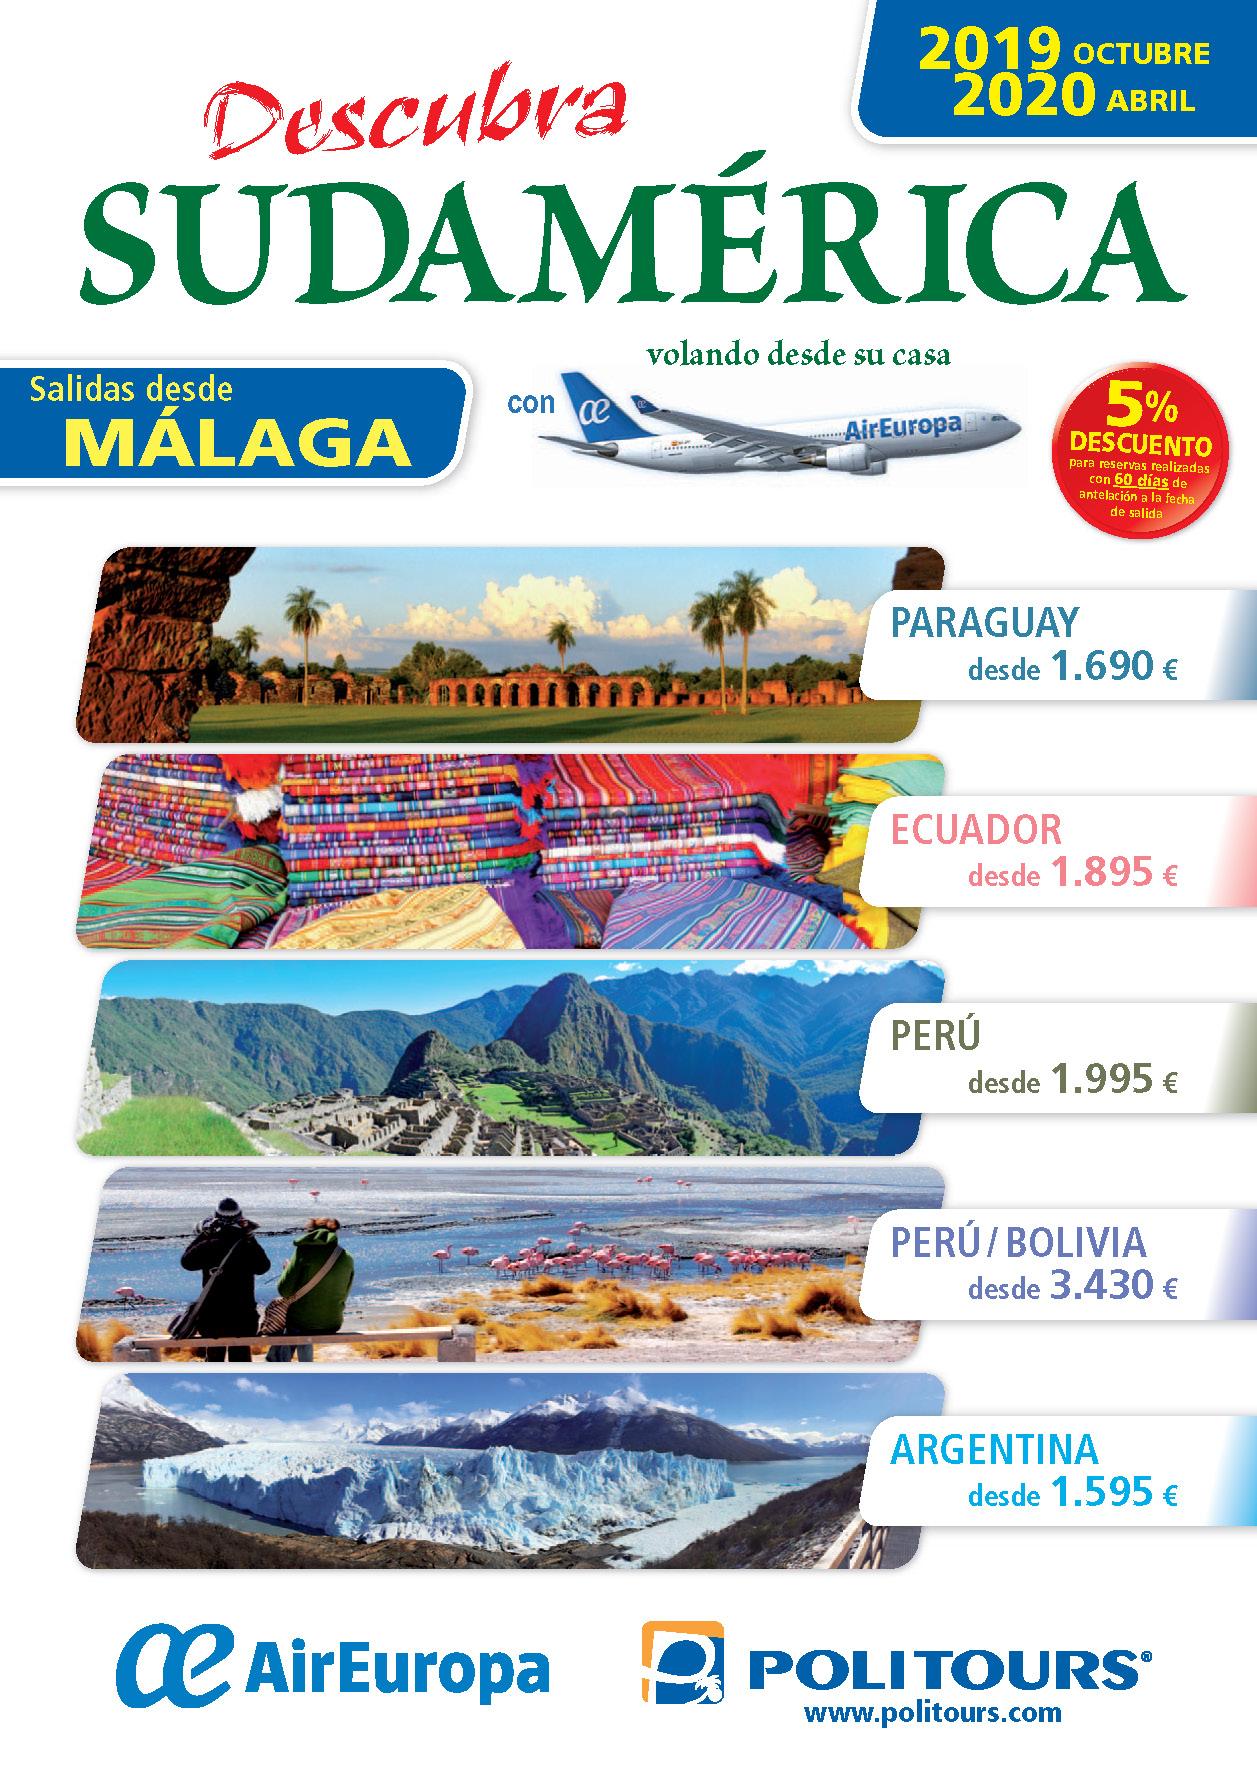 Catalogo Politours Sudamerica desde Malaga 2019-2020